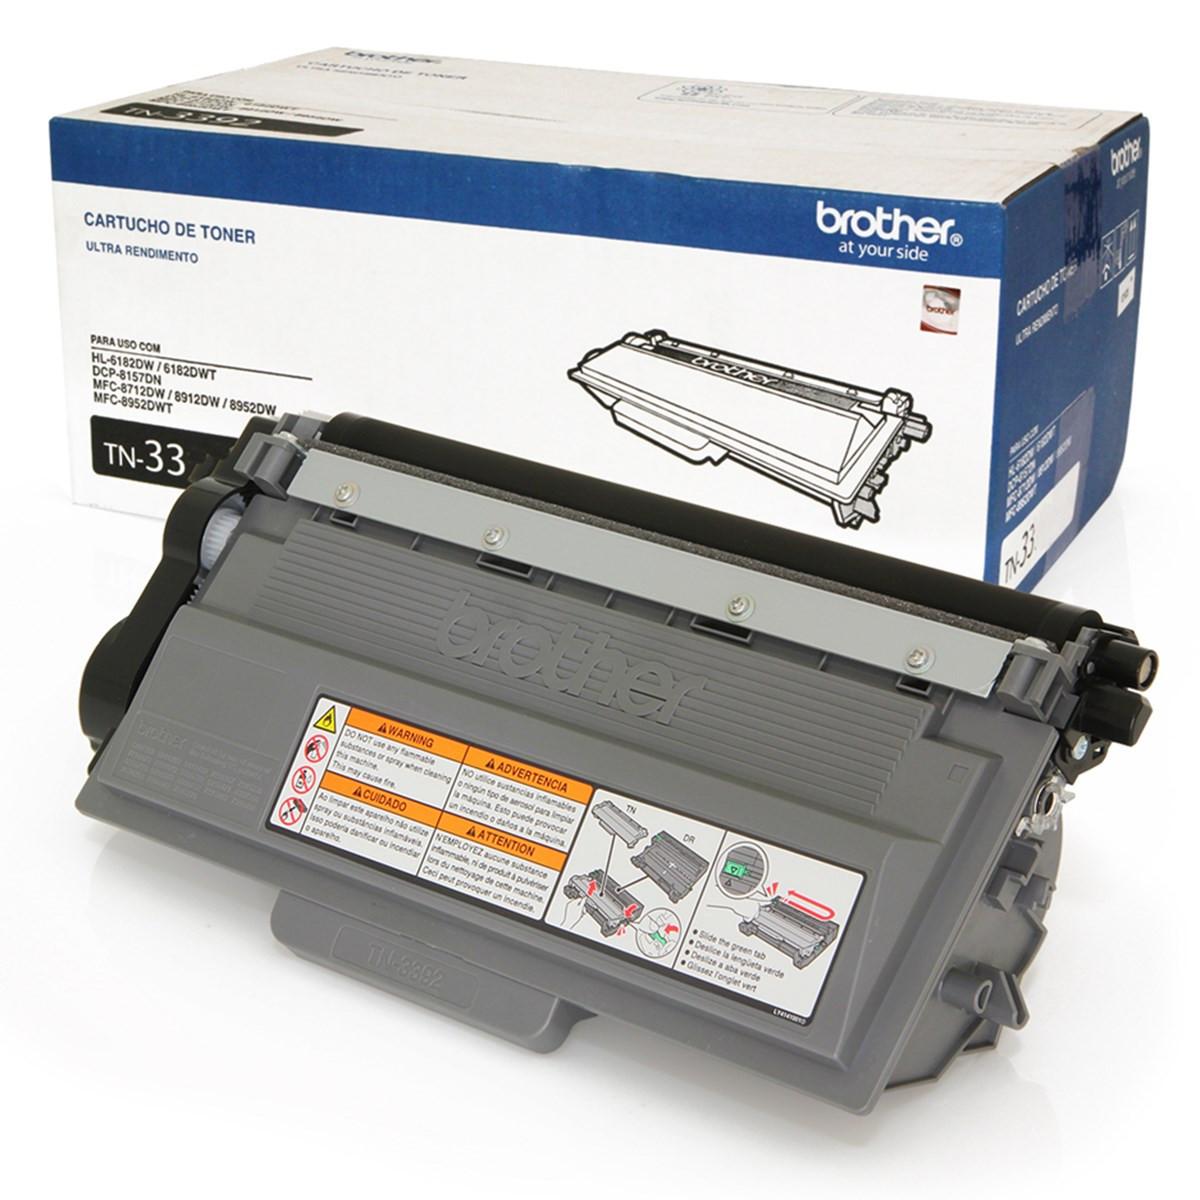 Toner Brother TN-3332 | DCP8112 HL5452 HL5472 DCP8152 MFC8512 8112DN 5452DN 5472DW 8152DN | Original